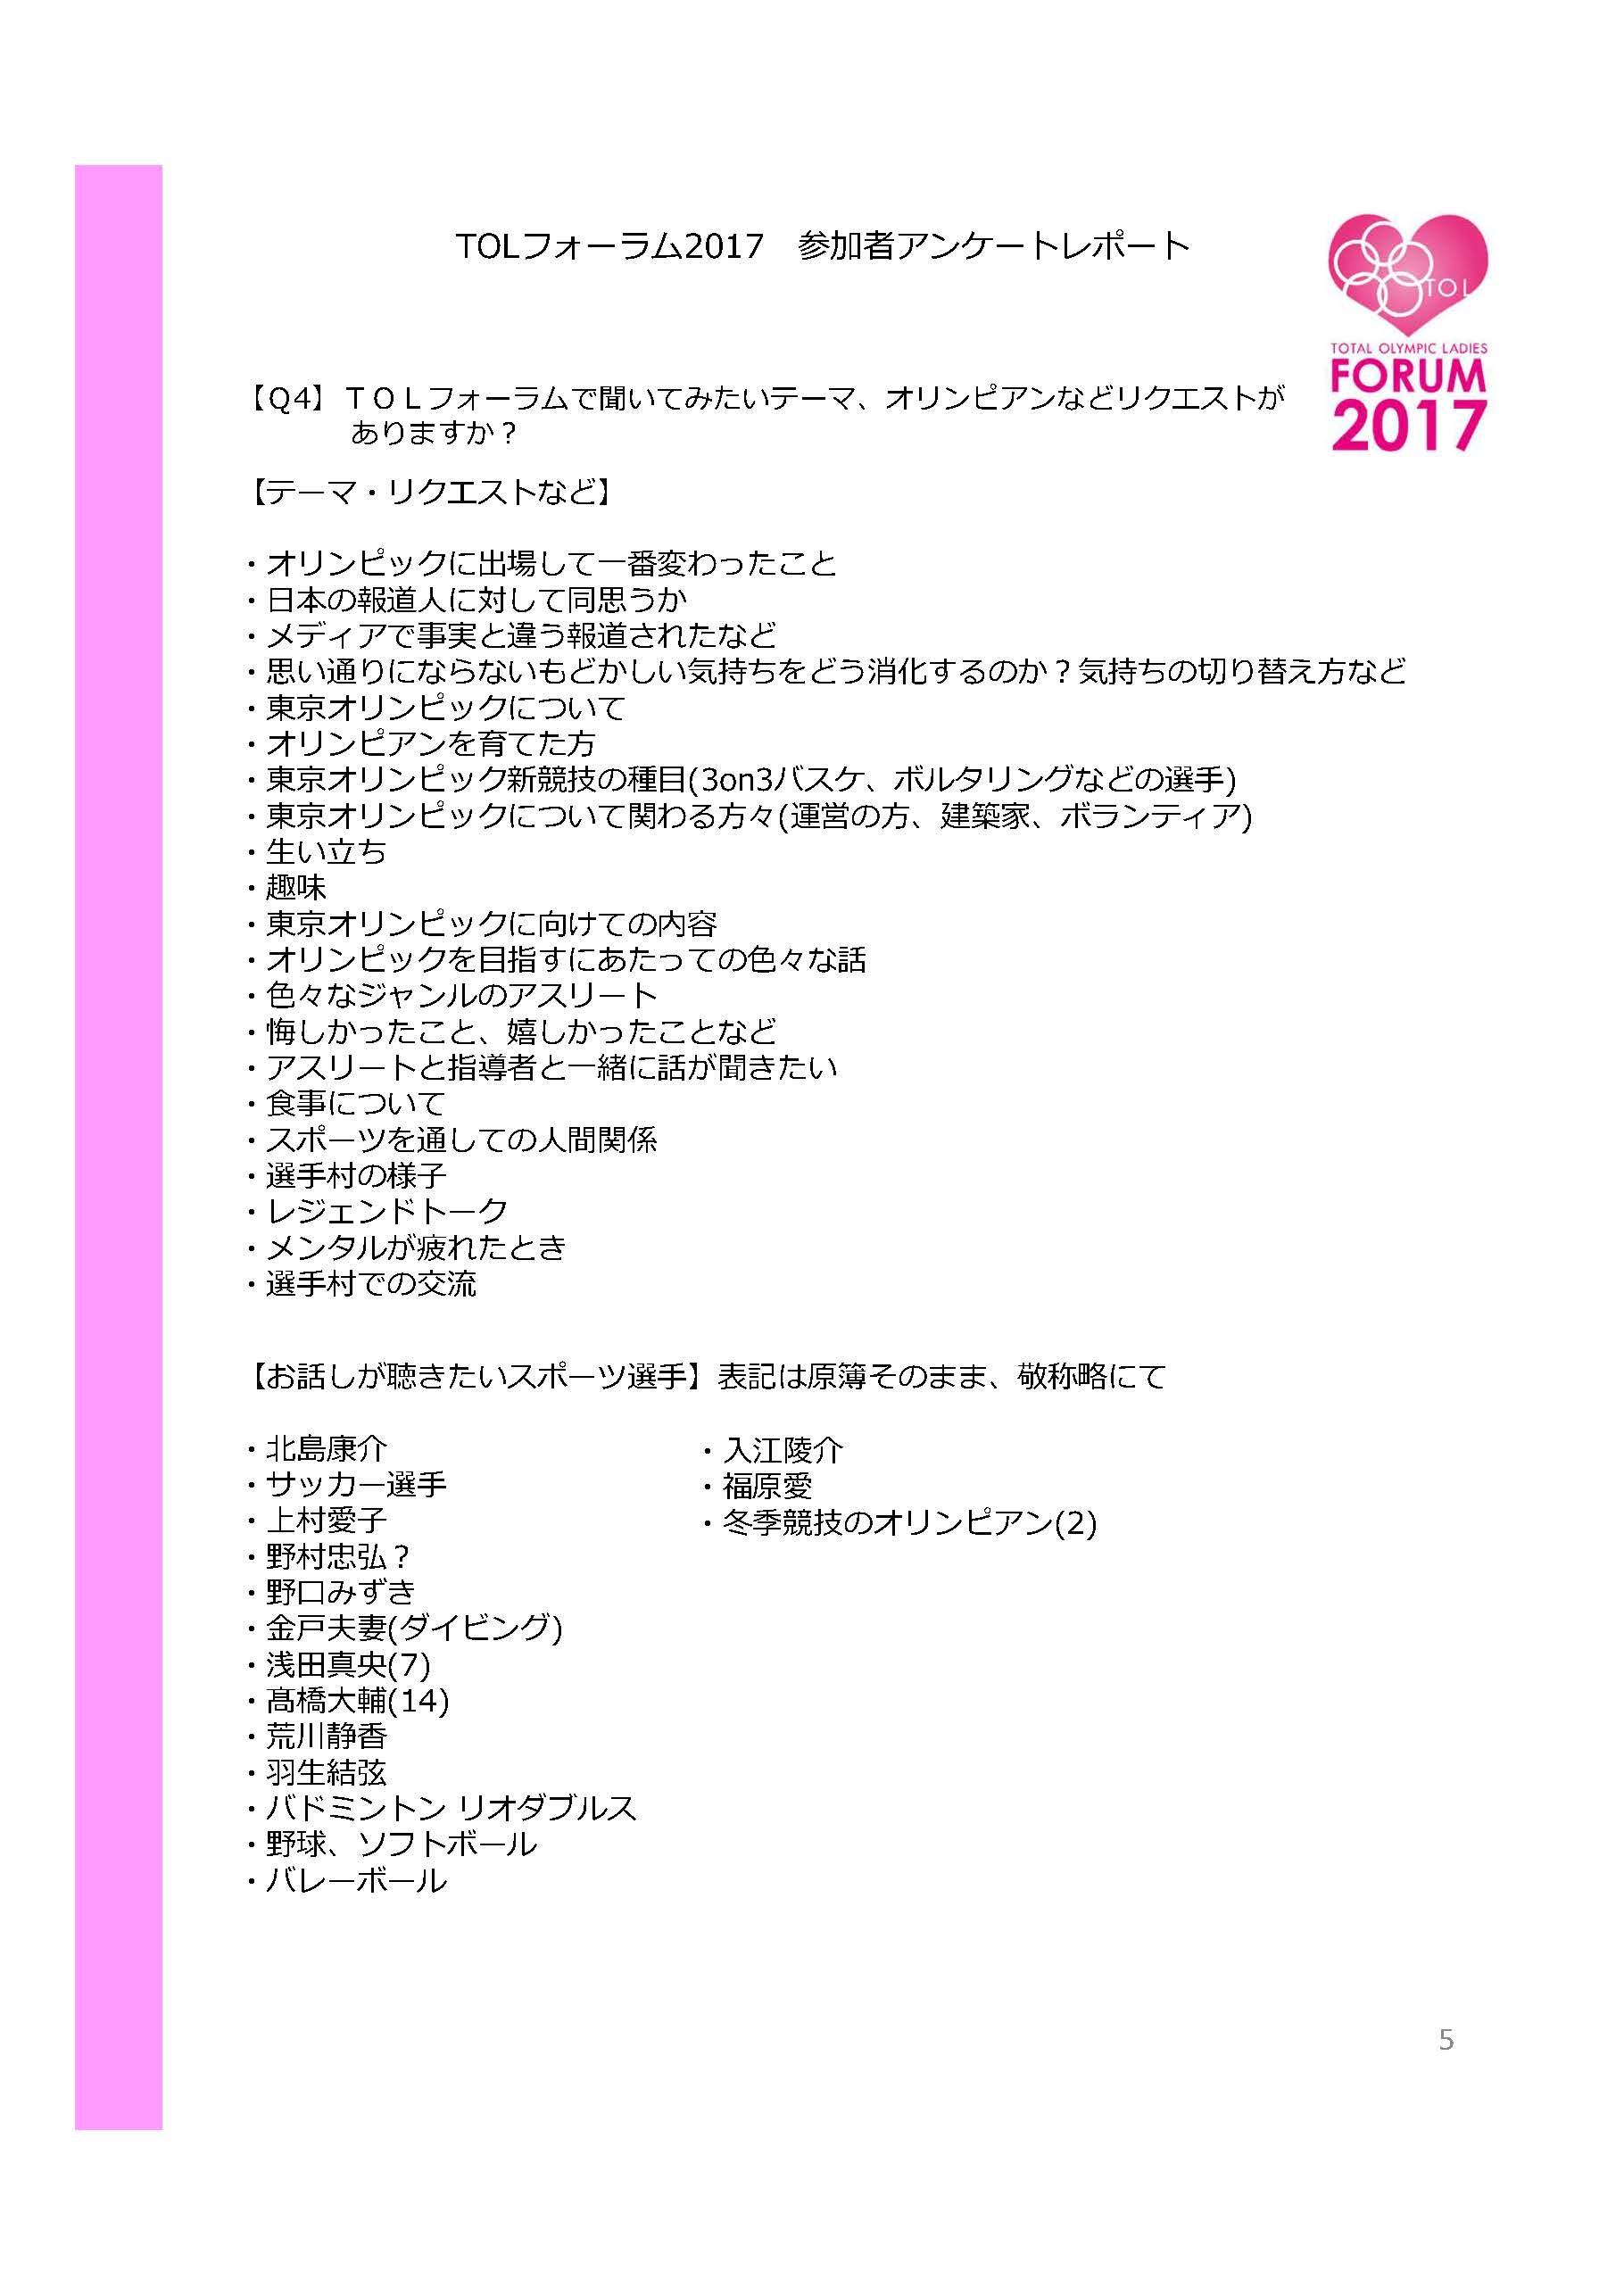 「TOLフォーラム2017アンケート集計報告書 集計:高山樹里、作成:金光貞幸